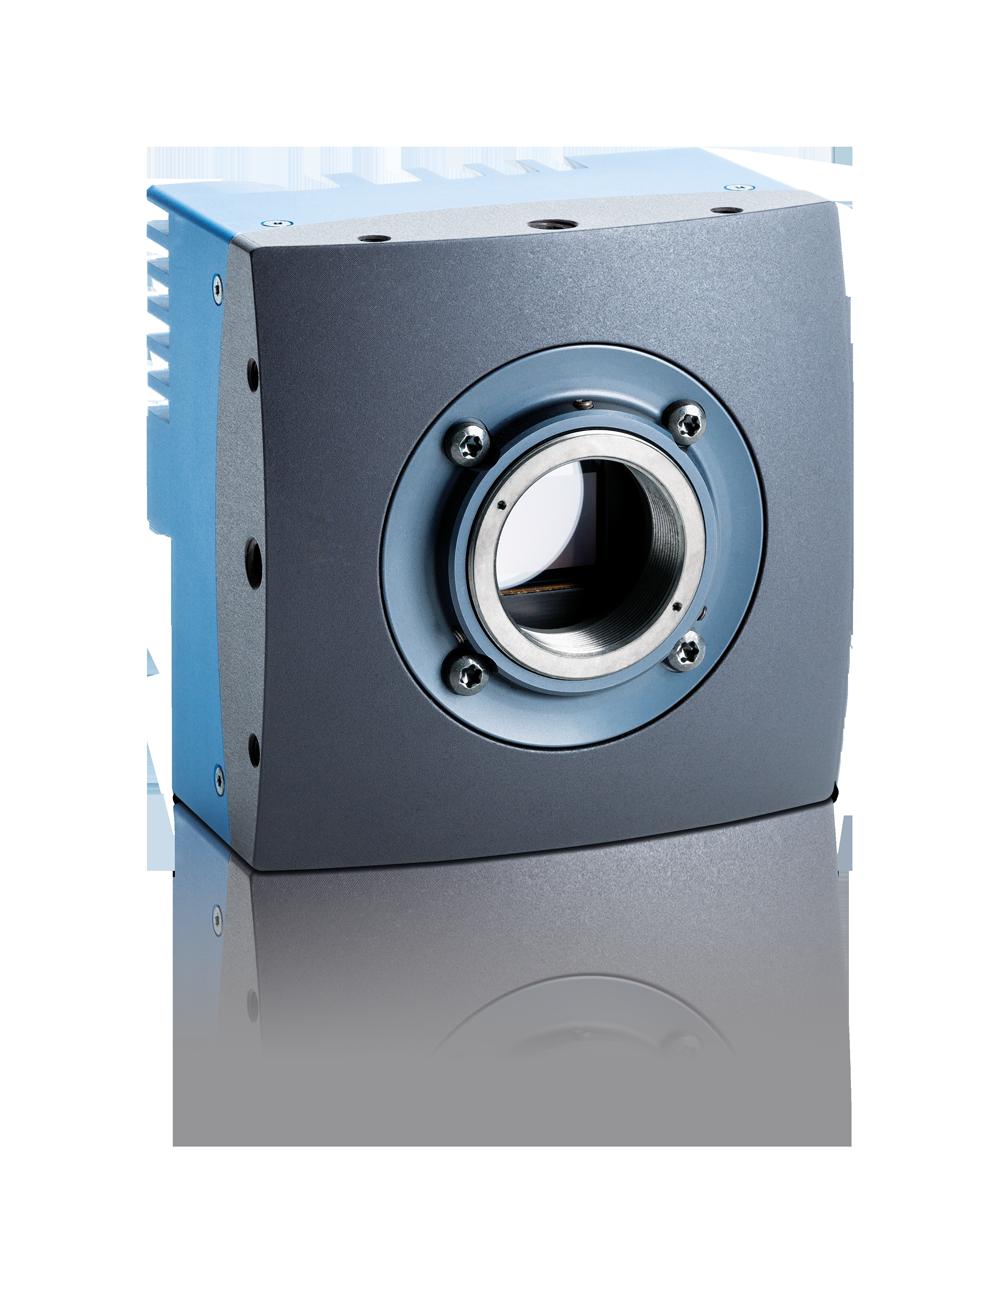 CoaXPress-2.0-Highspeed-Kamera